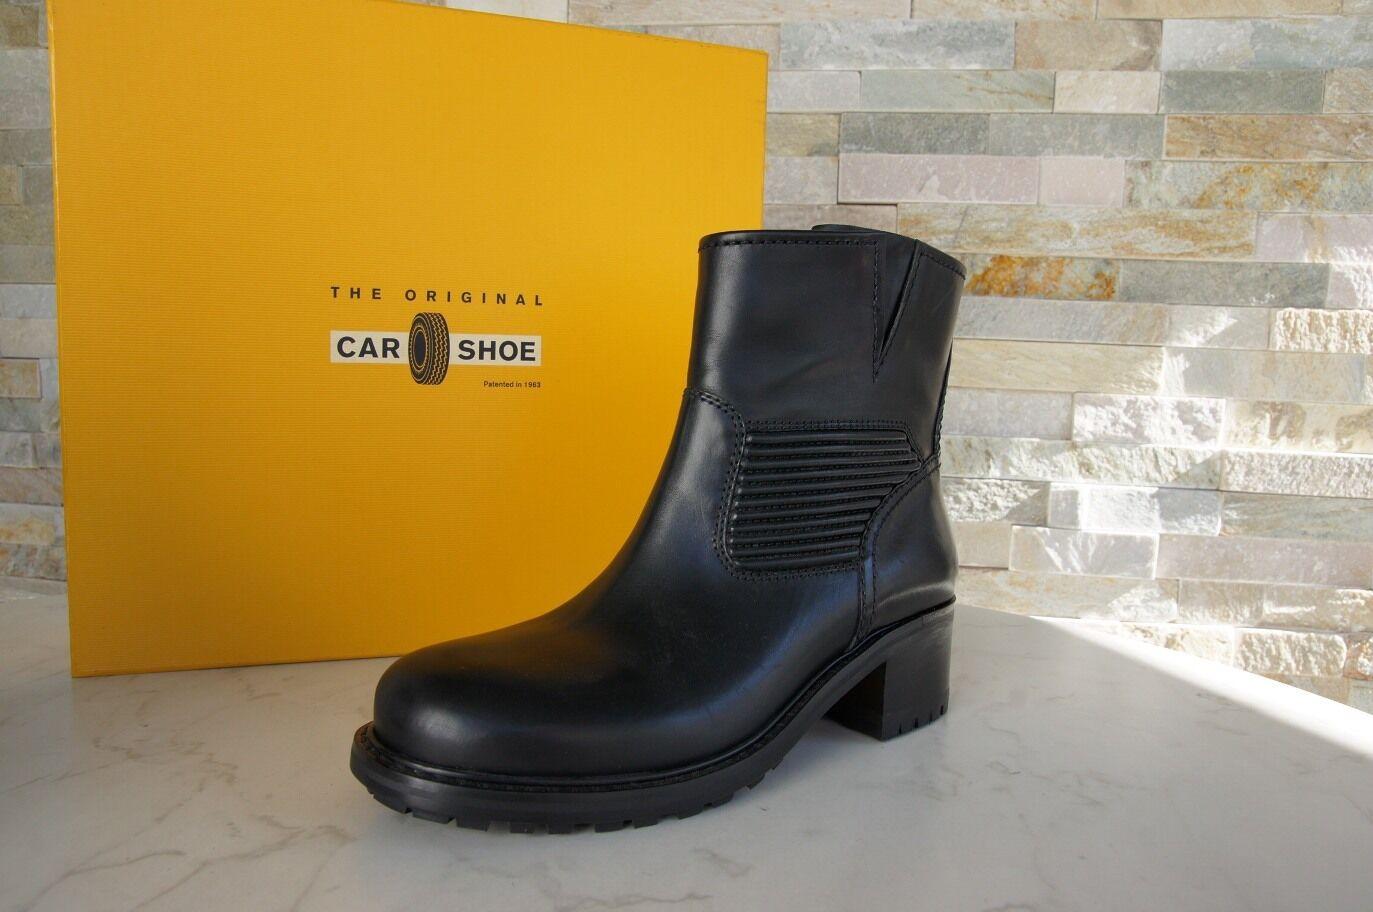 Car shoes Boots Sz. 36,5 Boots shoes KDT78J Black New Previously